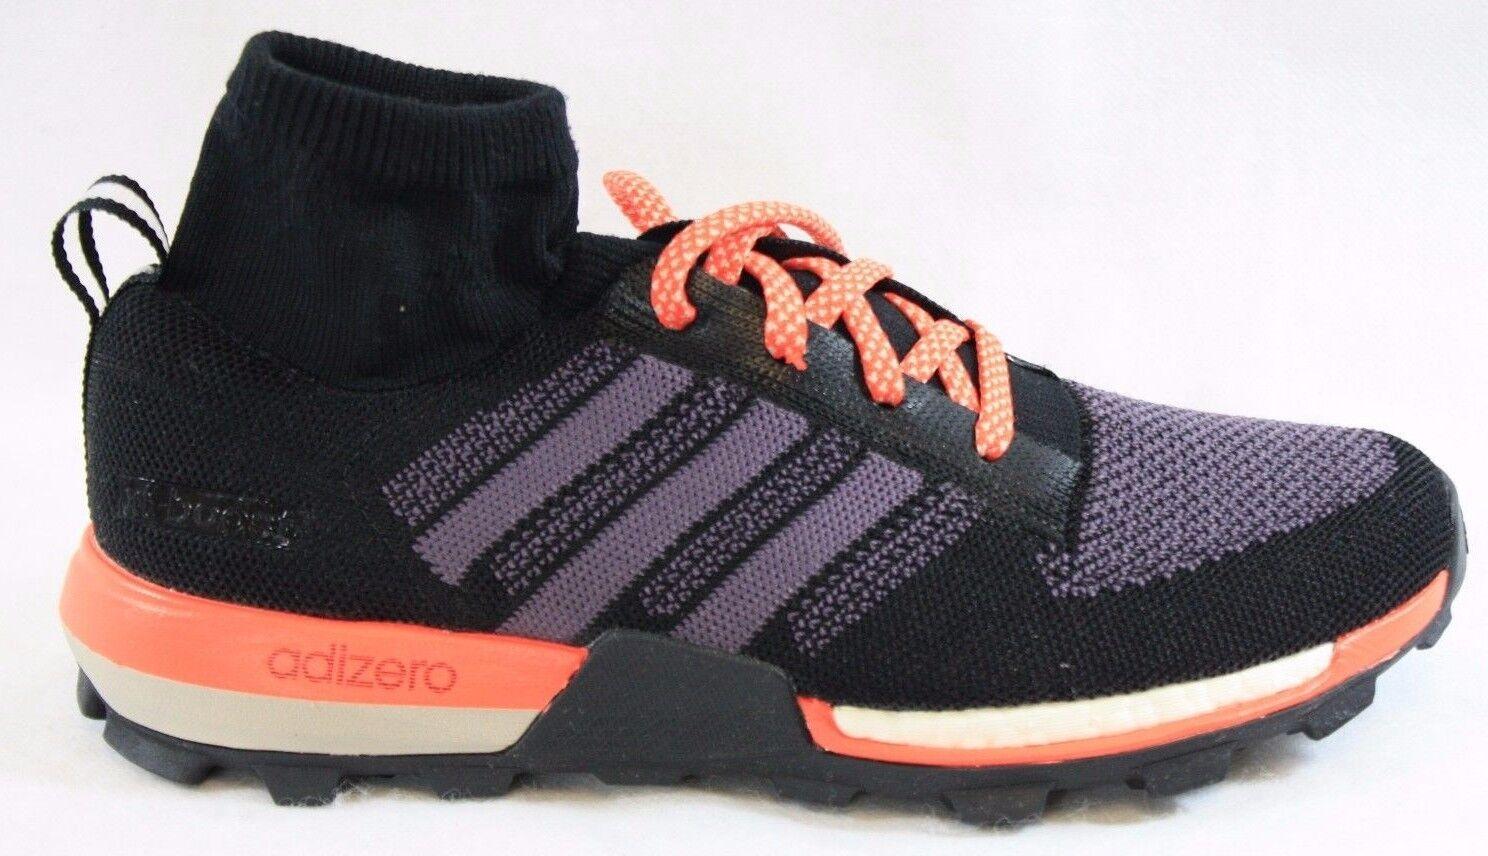 NEW Womens Sz 7 ADIDAS Adizero XT Prime Boost B23491 Black Purple Sneaker shoes